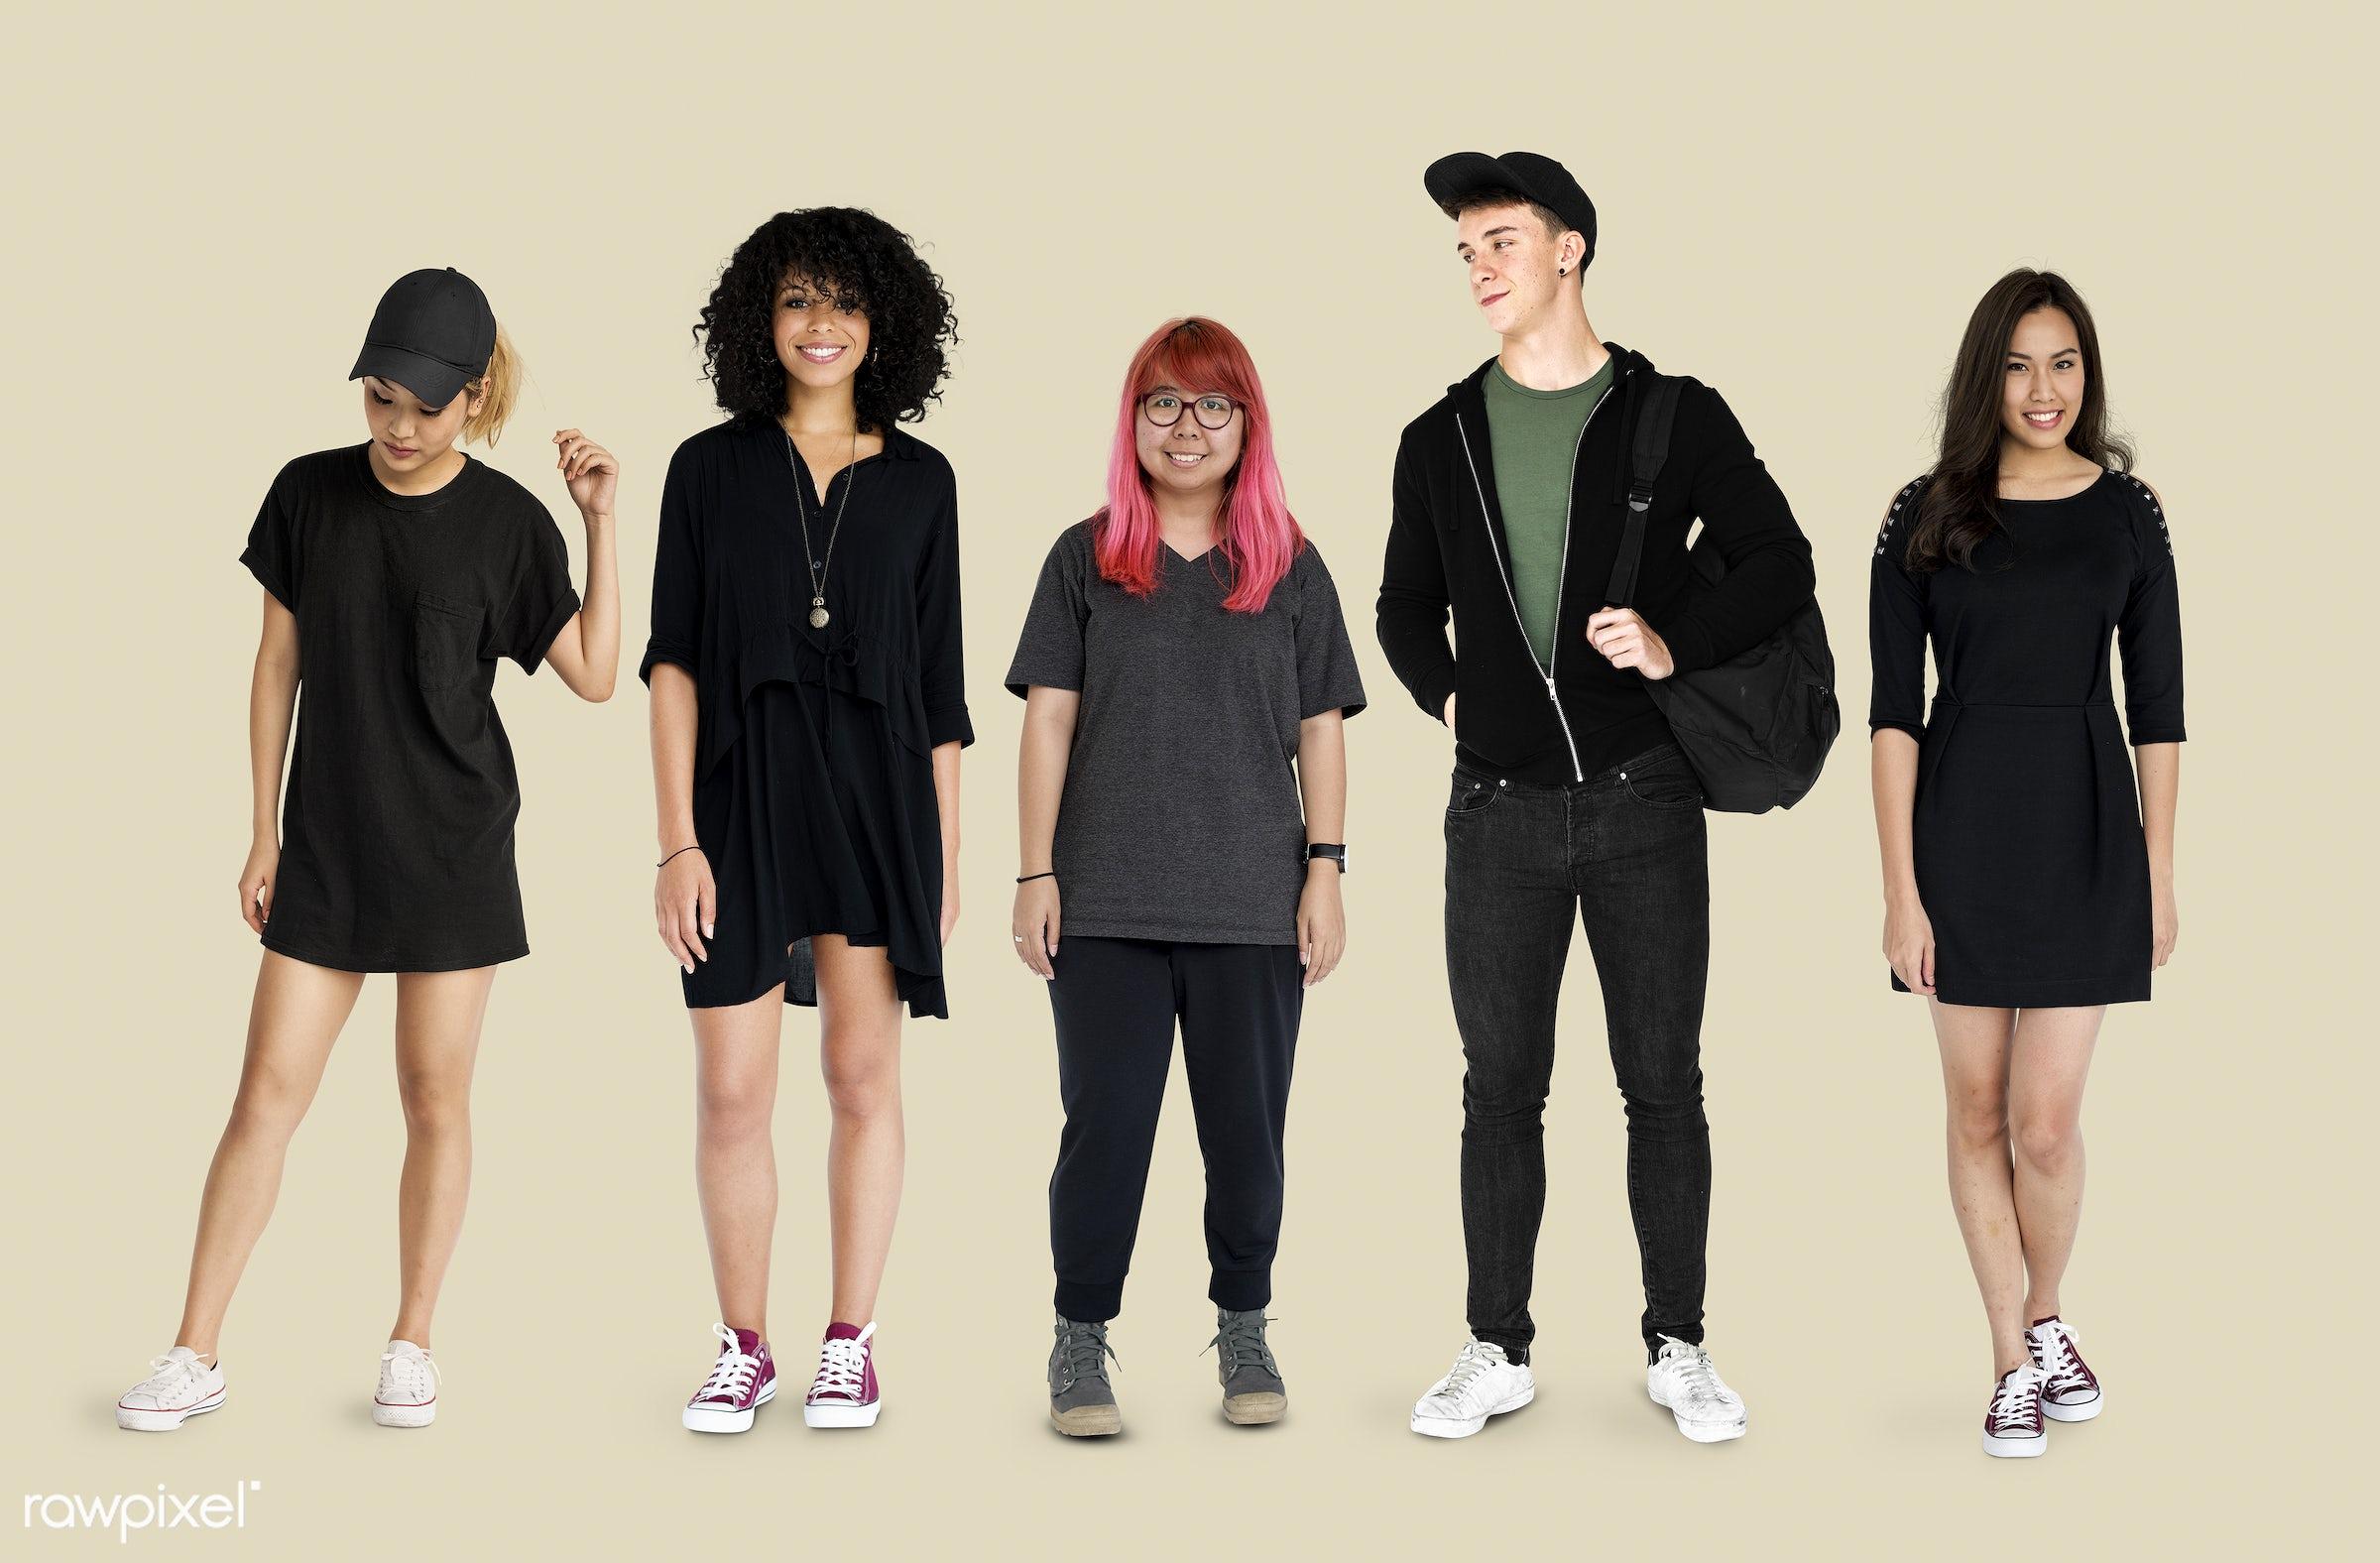 studio, person, diverse, set, millennials, entertain, collection, recreation, pretty, people, teenage, caucasian, asian,...